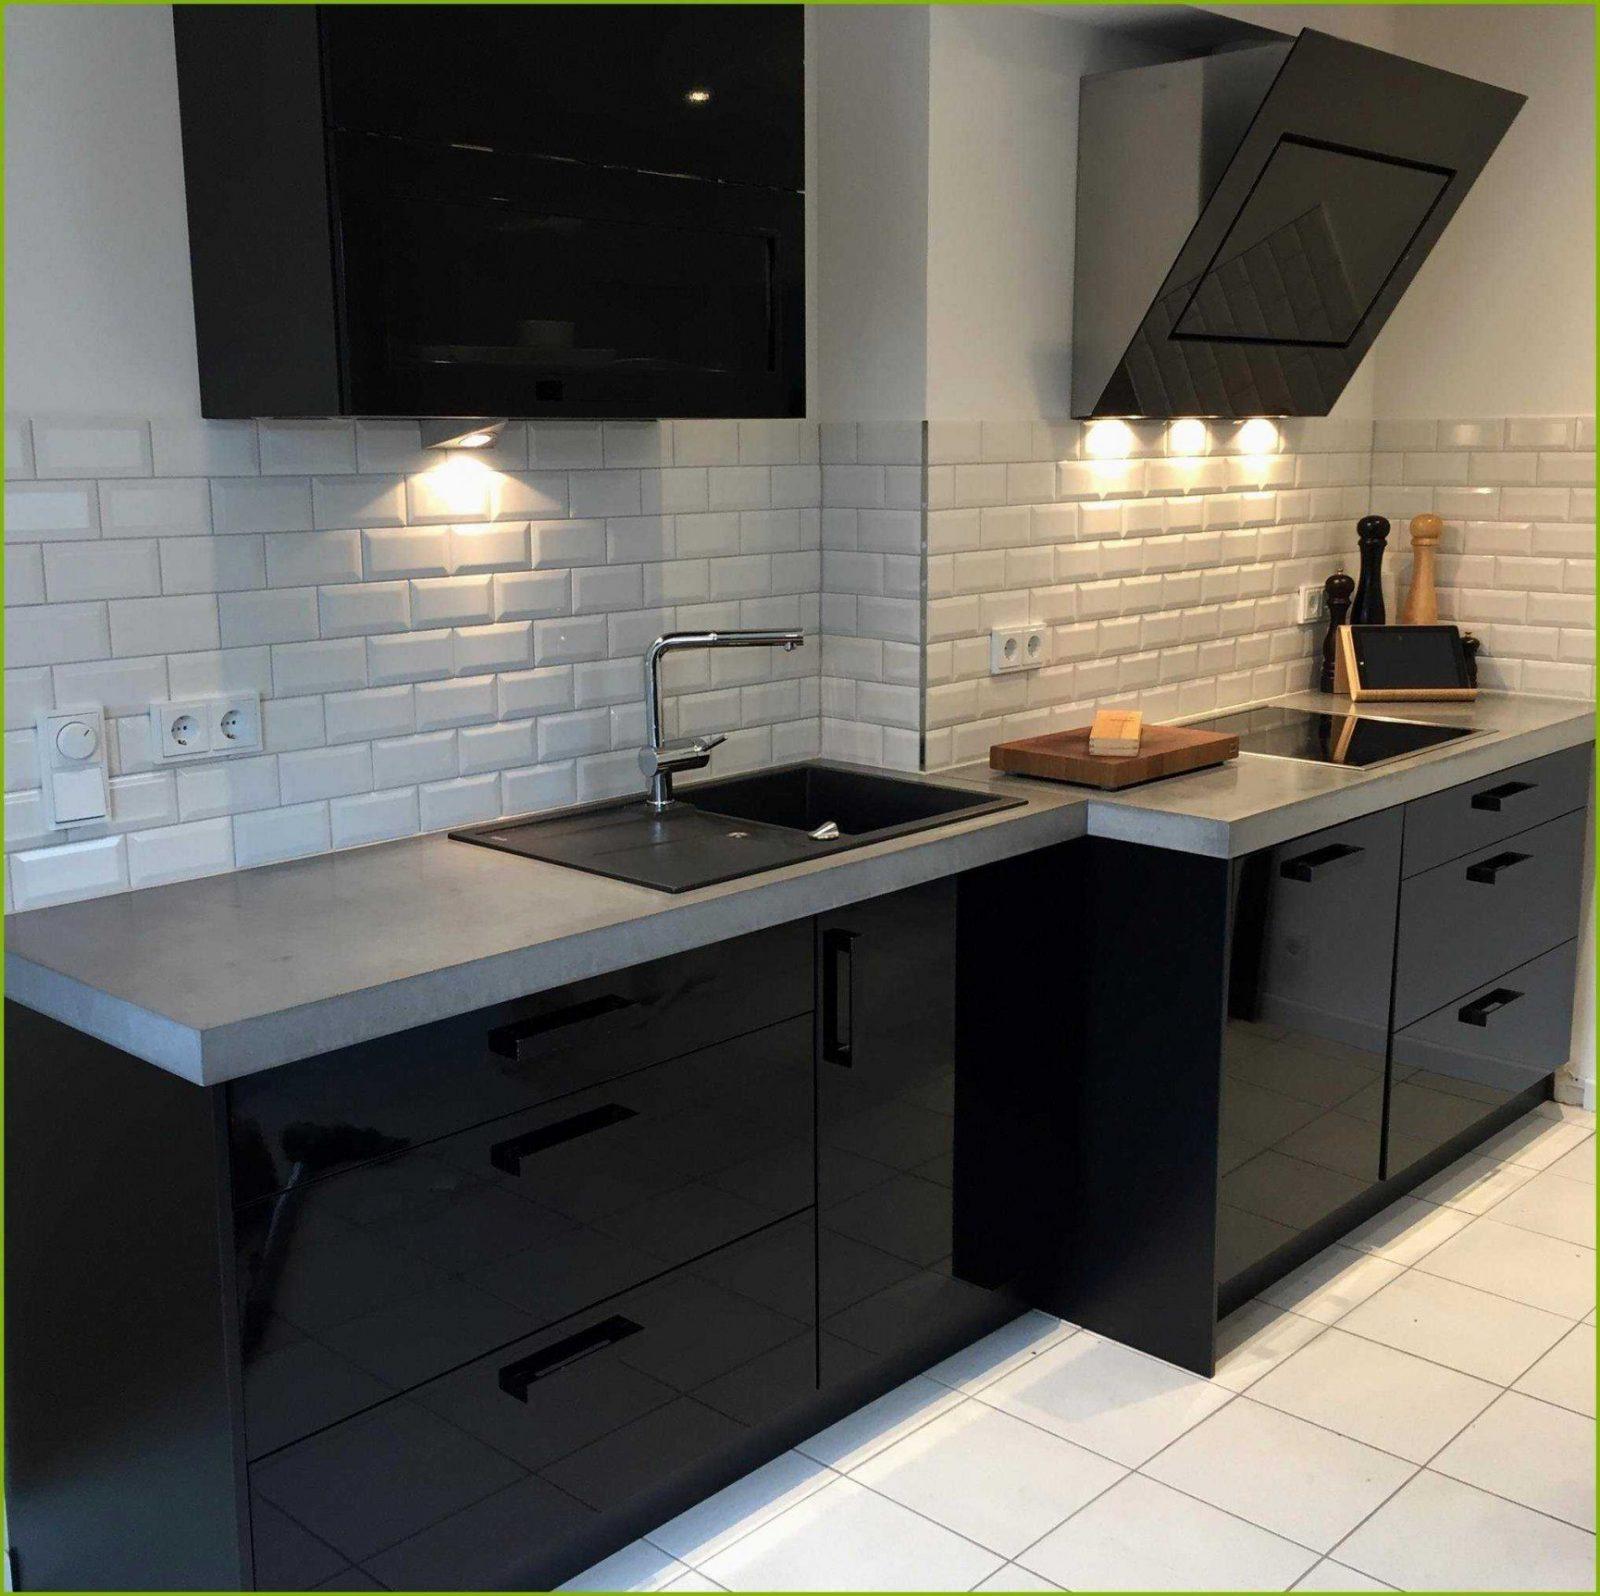 beton cir h k chenarbeitsplatte in betonoptik mimimia. Black Bedroom Furniture Sets. Home Design Ideas